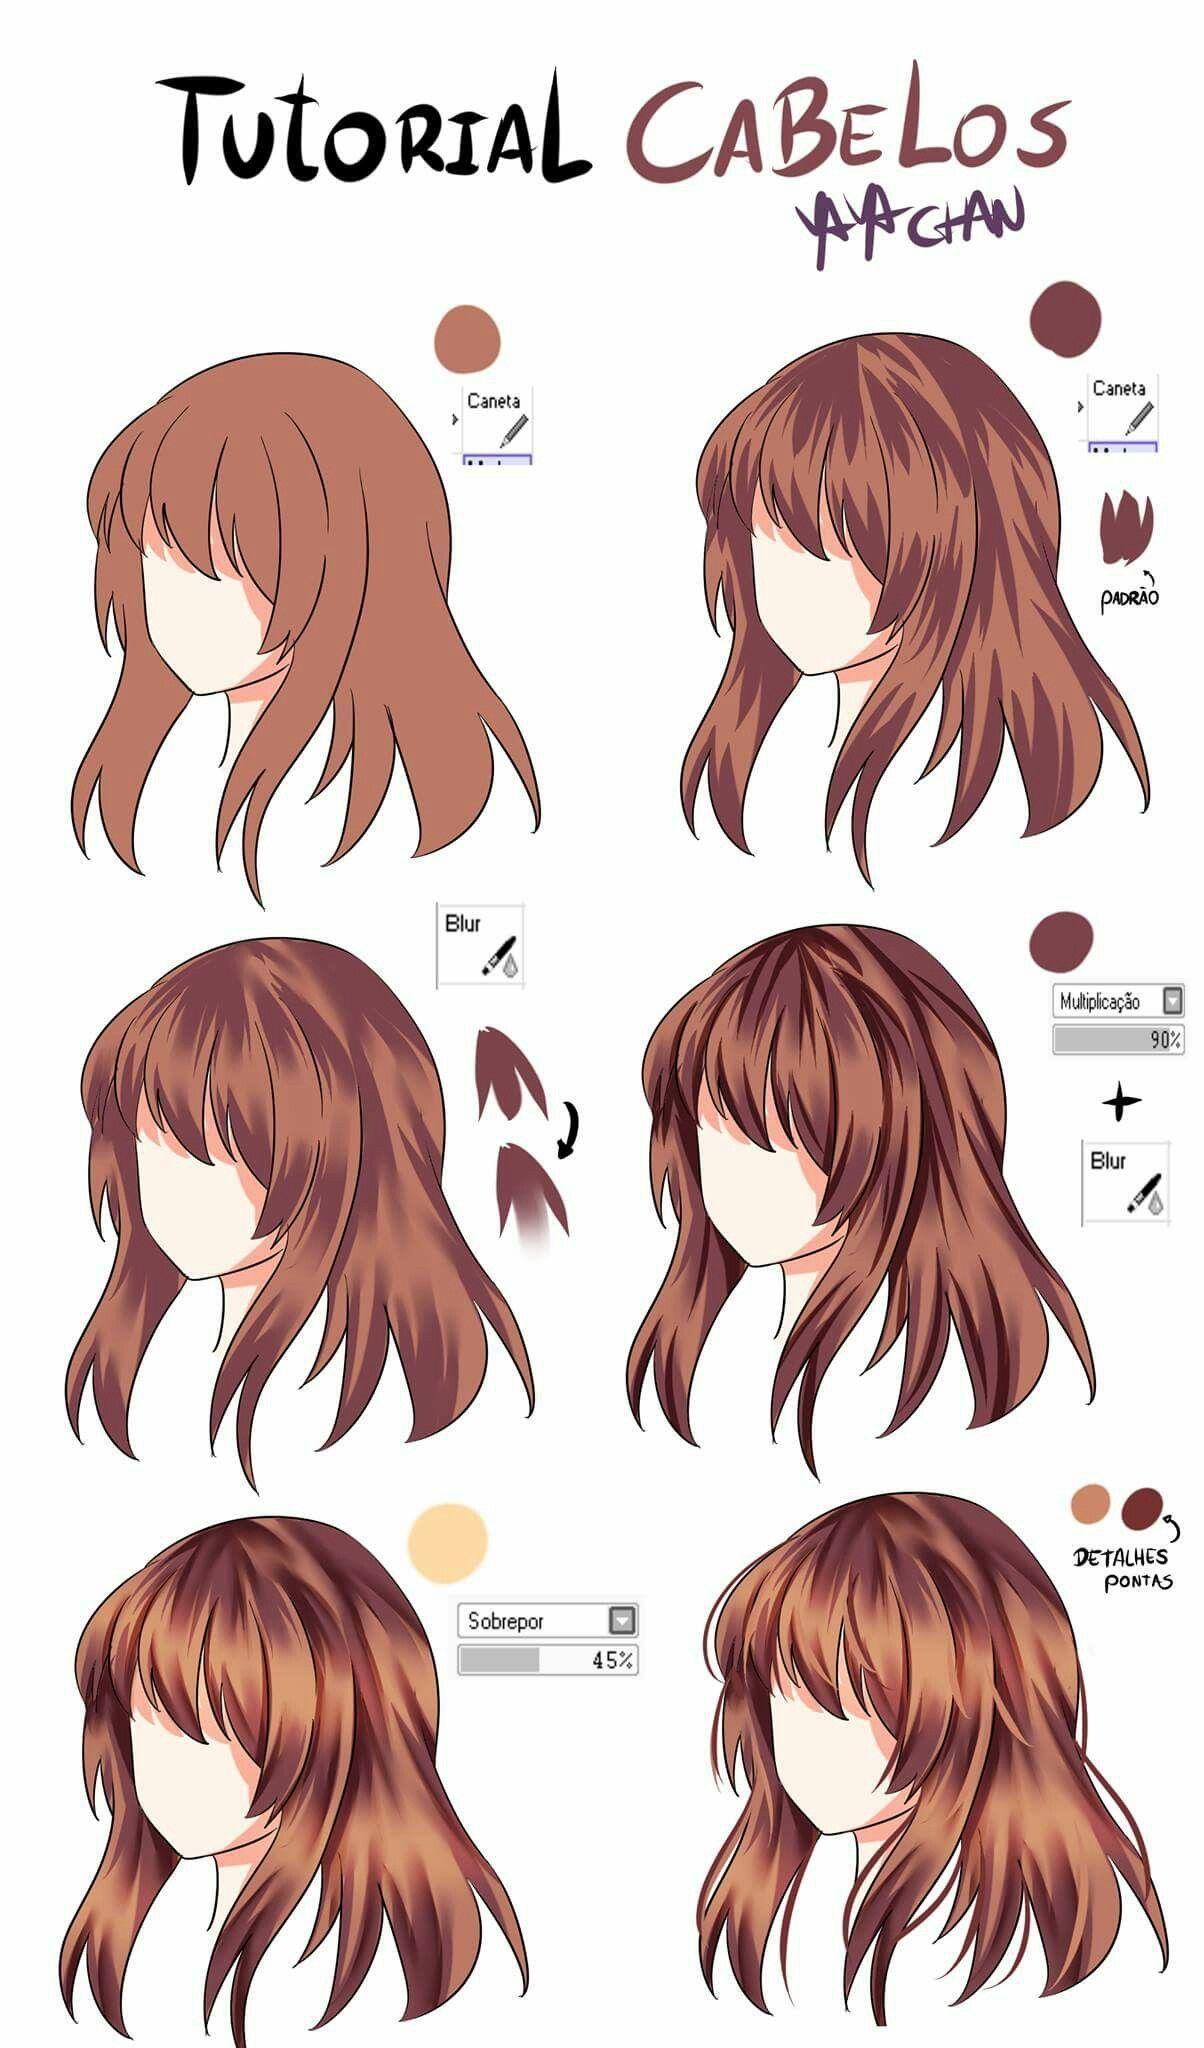 Hairstyle Shading Art Reference Menggambar Rambut Tutorial Gambar Kartun Sketsa